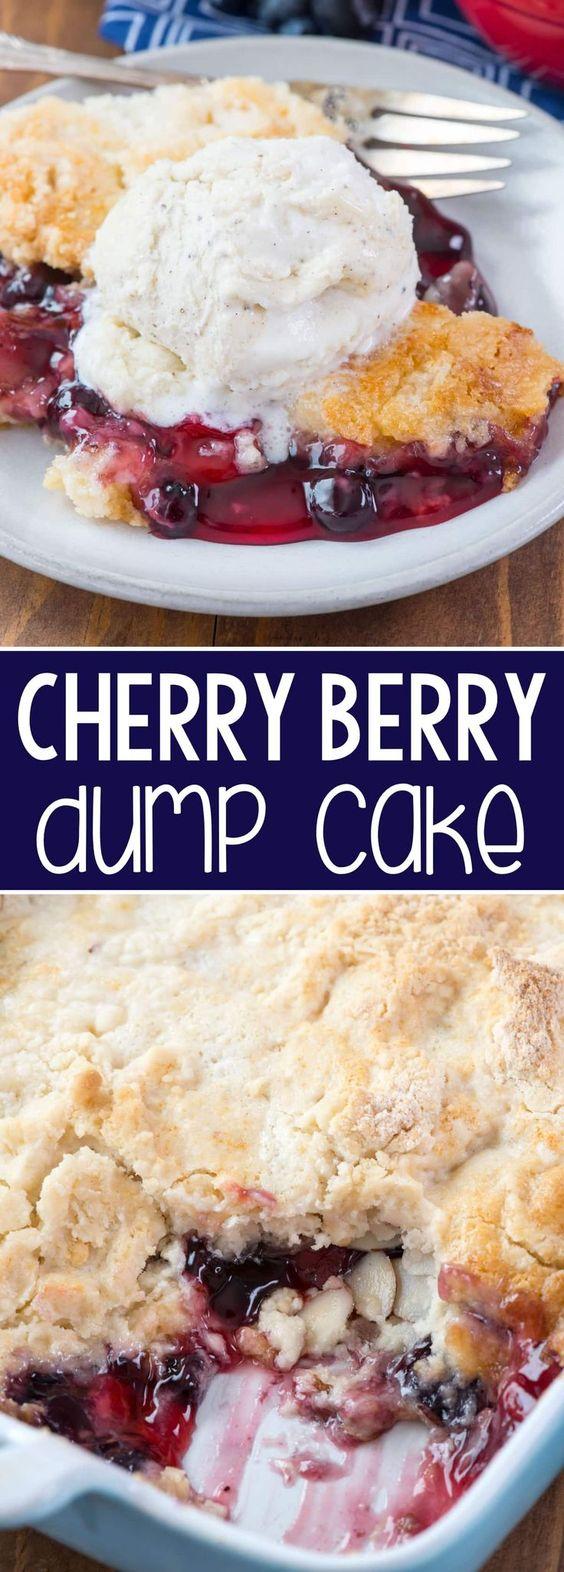 Cherry Berry Dump Cake Recipe